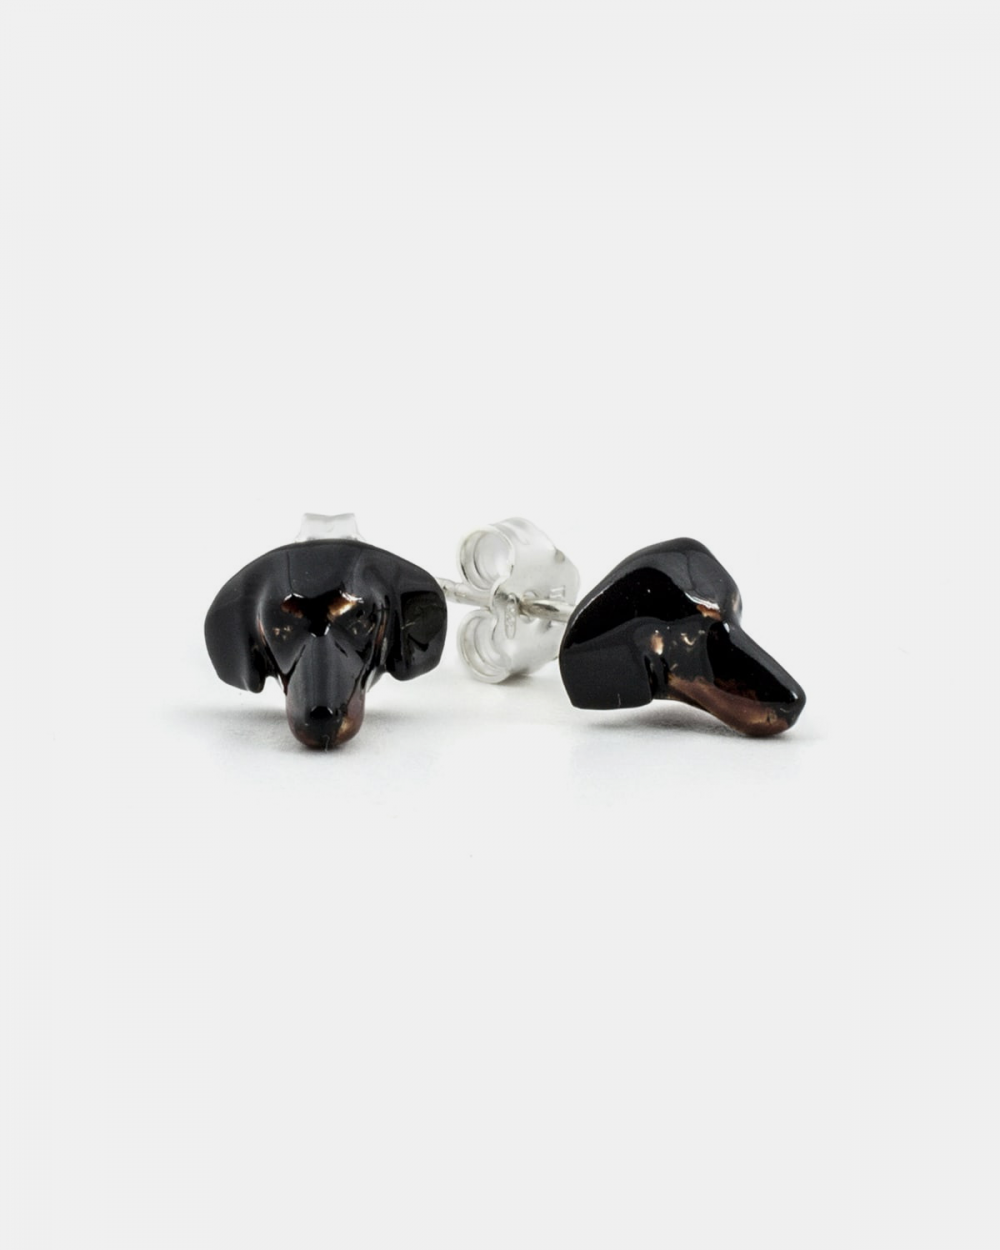 Earrings DACHSHUND COUPLE EARRINGS / ENAMELLED NOVE25